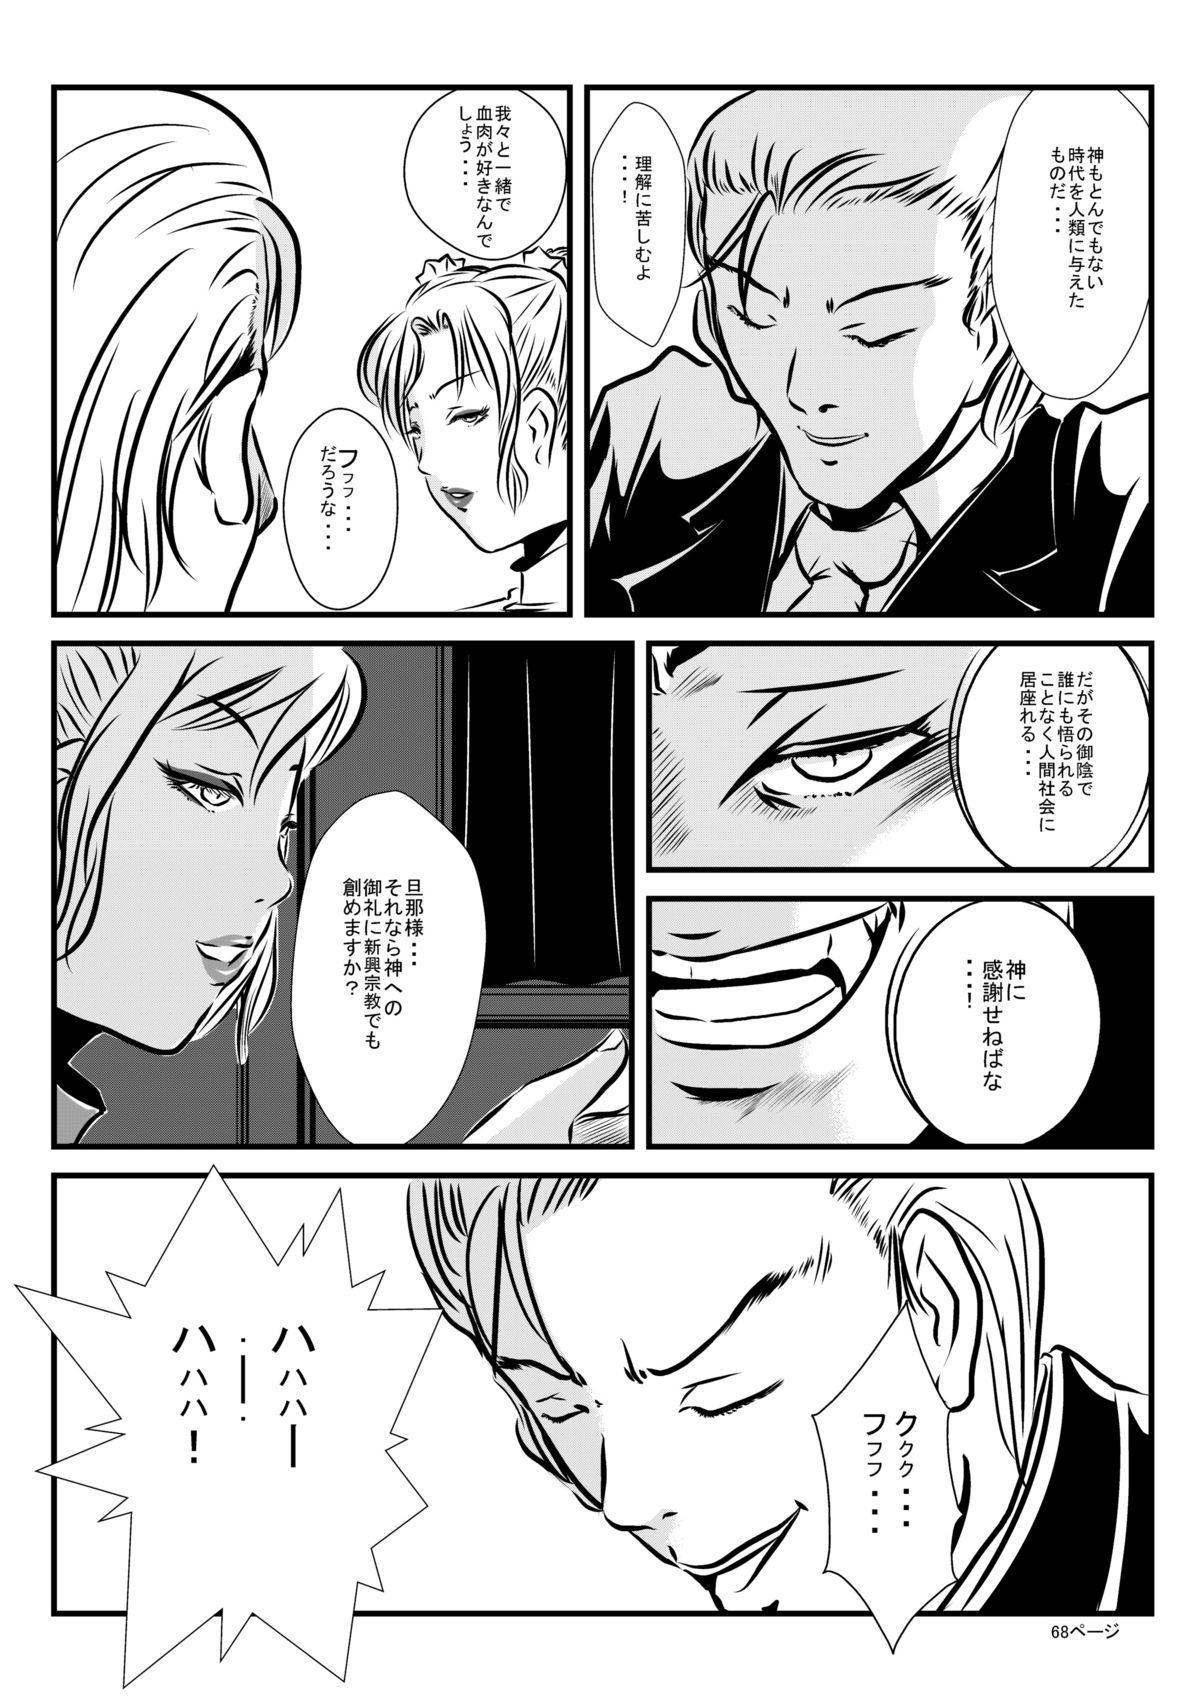 Loli Type no Jikkensitsu 66